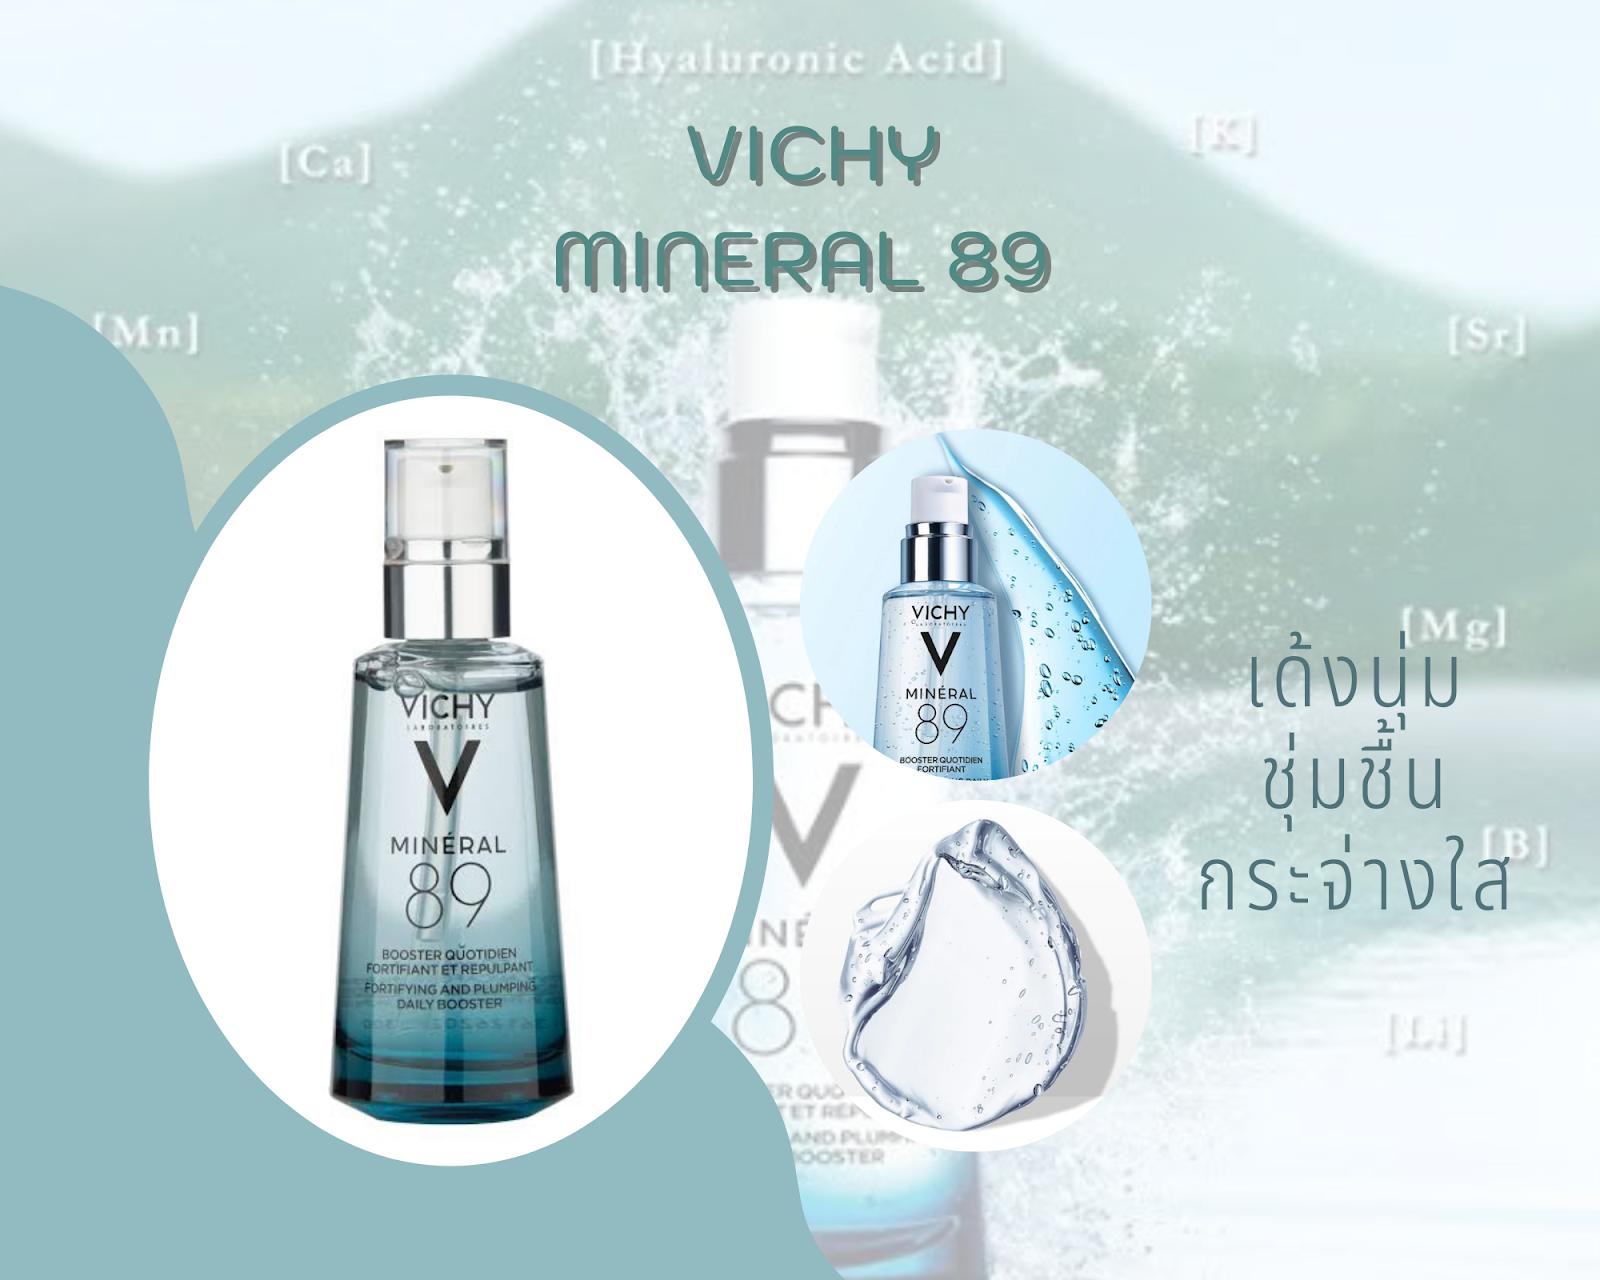 9. VICHY MINERAL 89